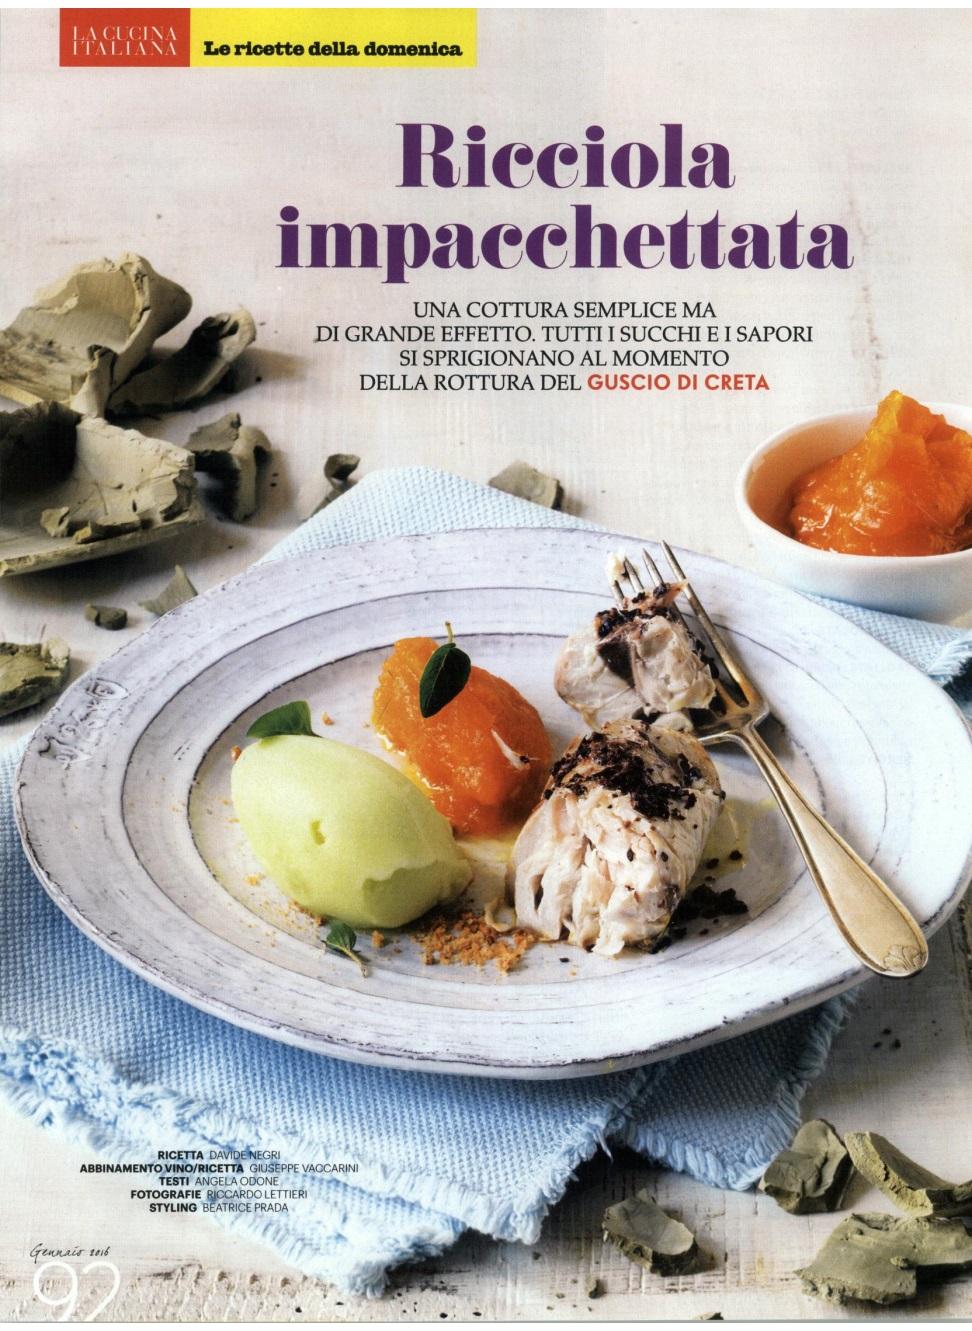 La Cucina Italiana 01.01.2016 pg 92